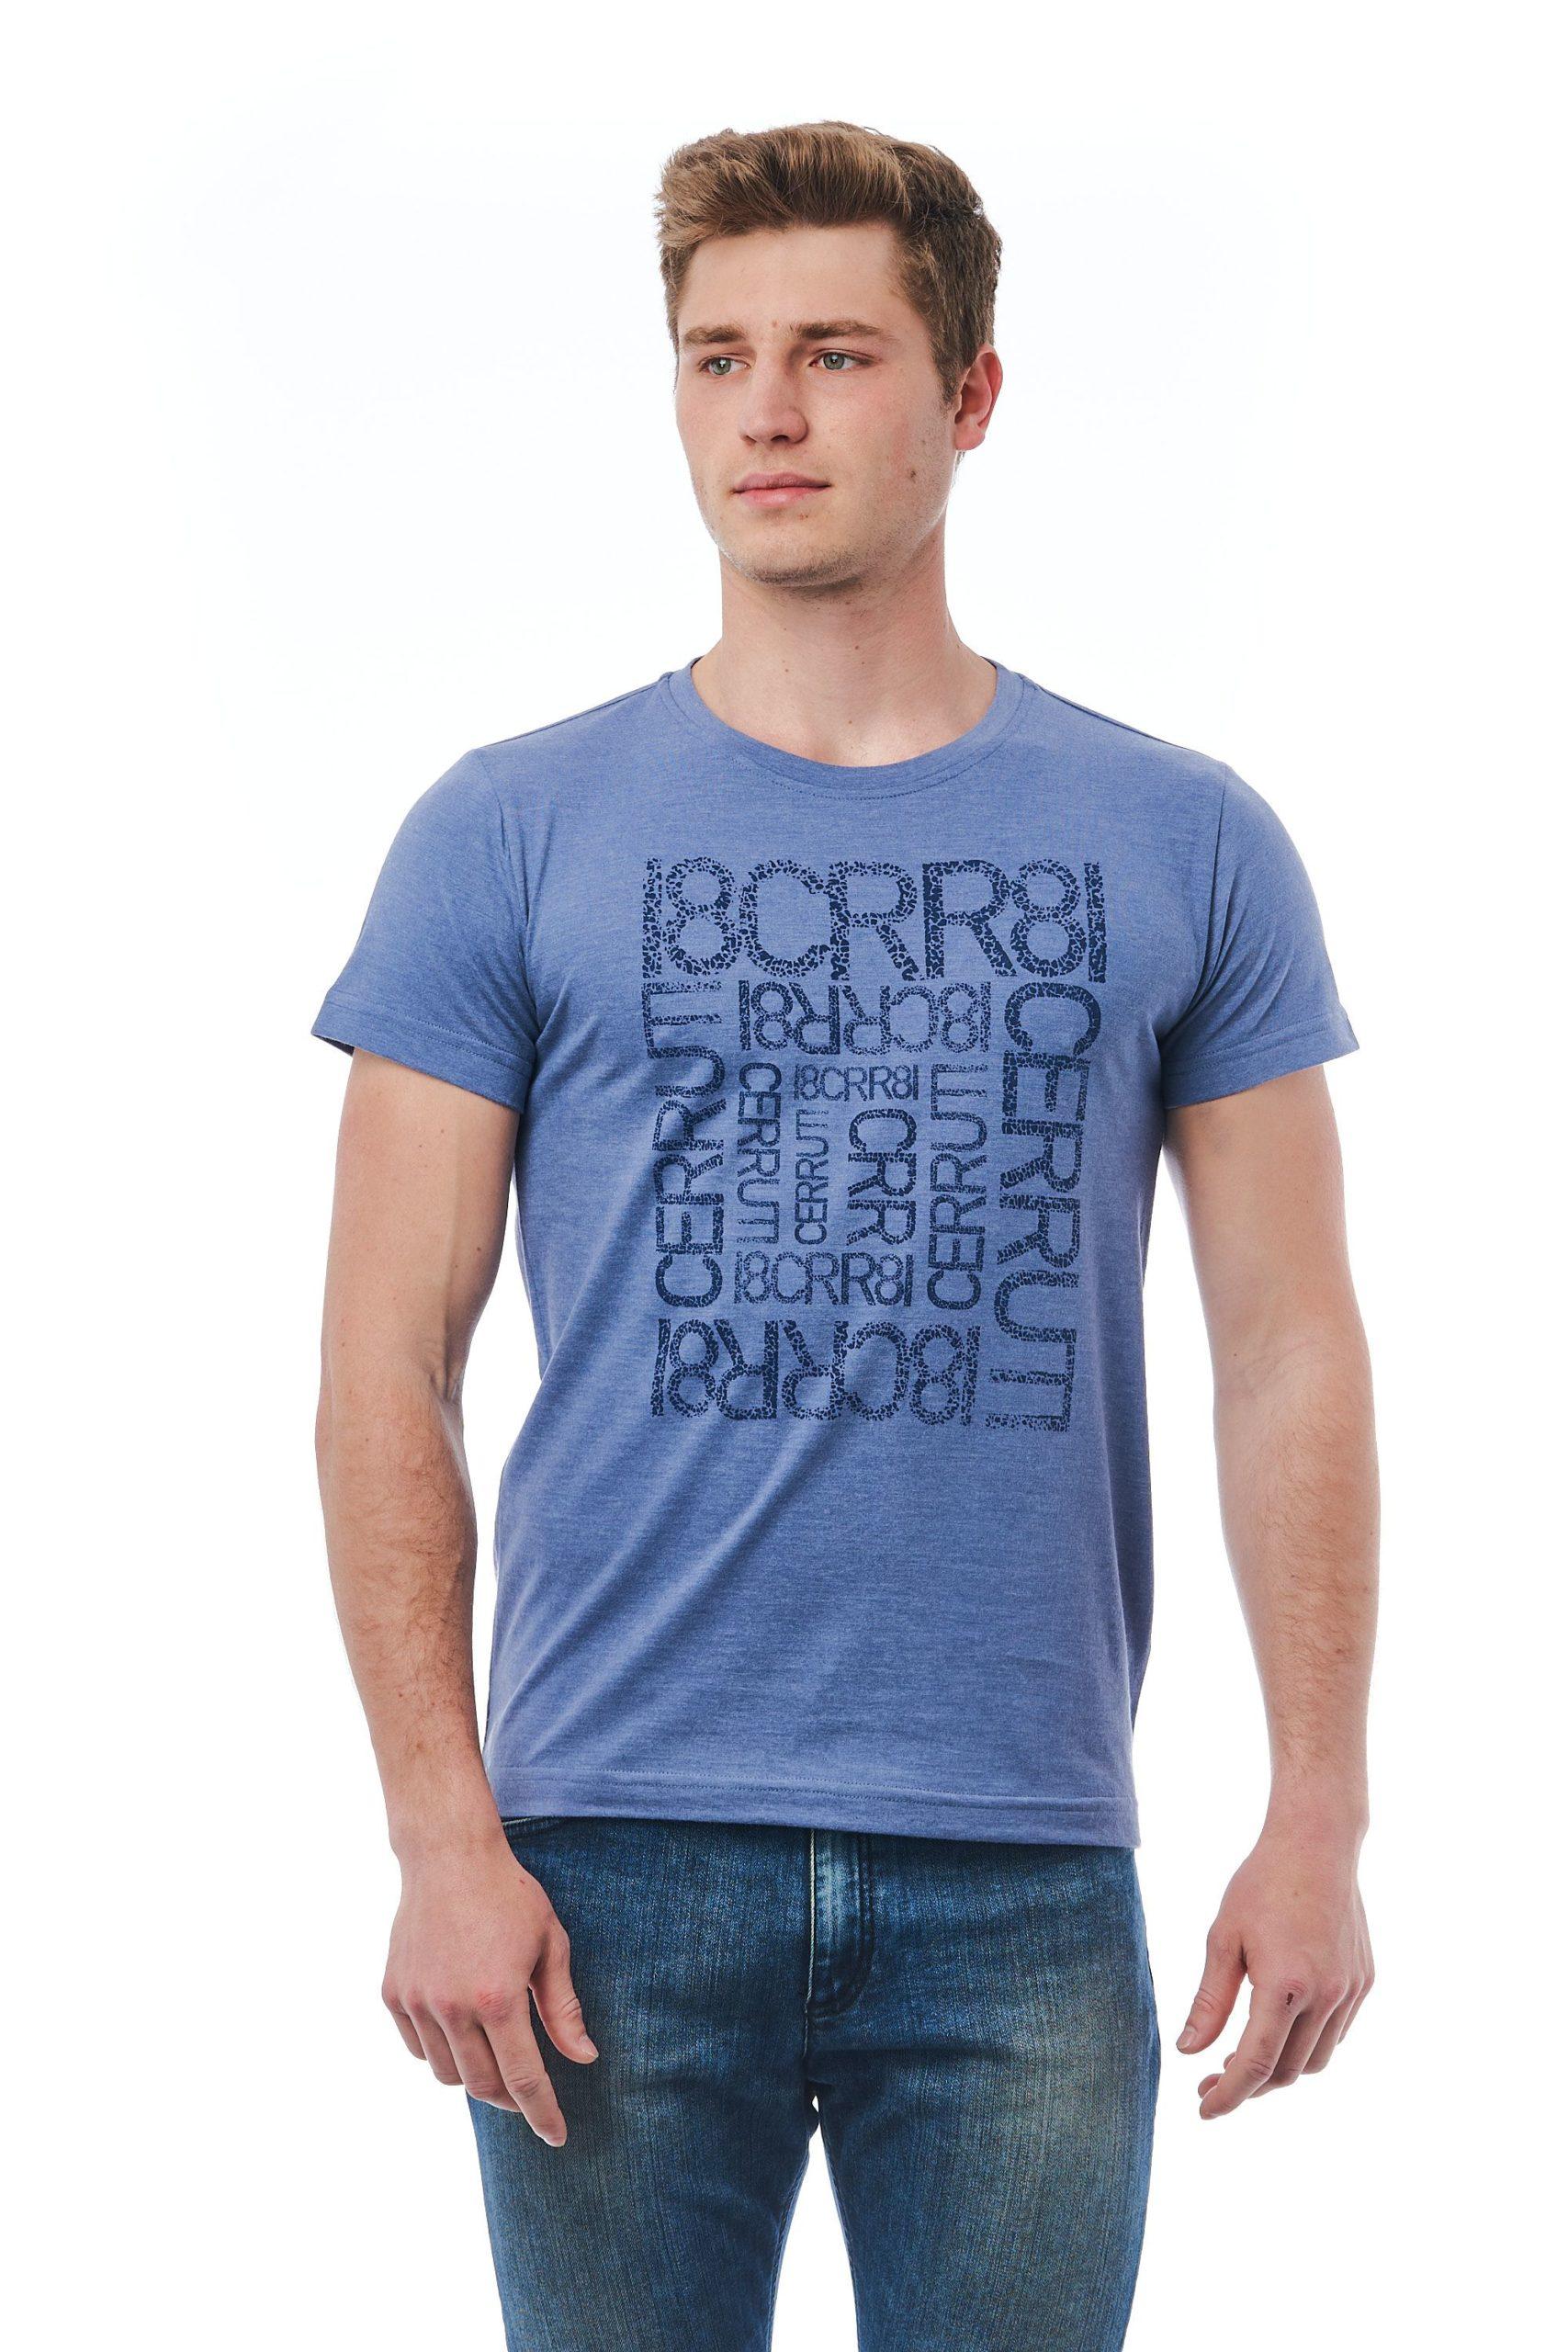 Cerruti 1881 Men's Avio T-Shirt Blue CE1409967 - M